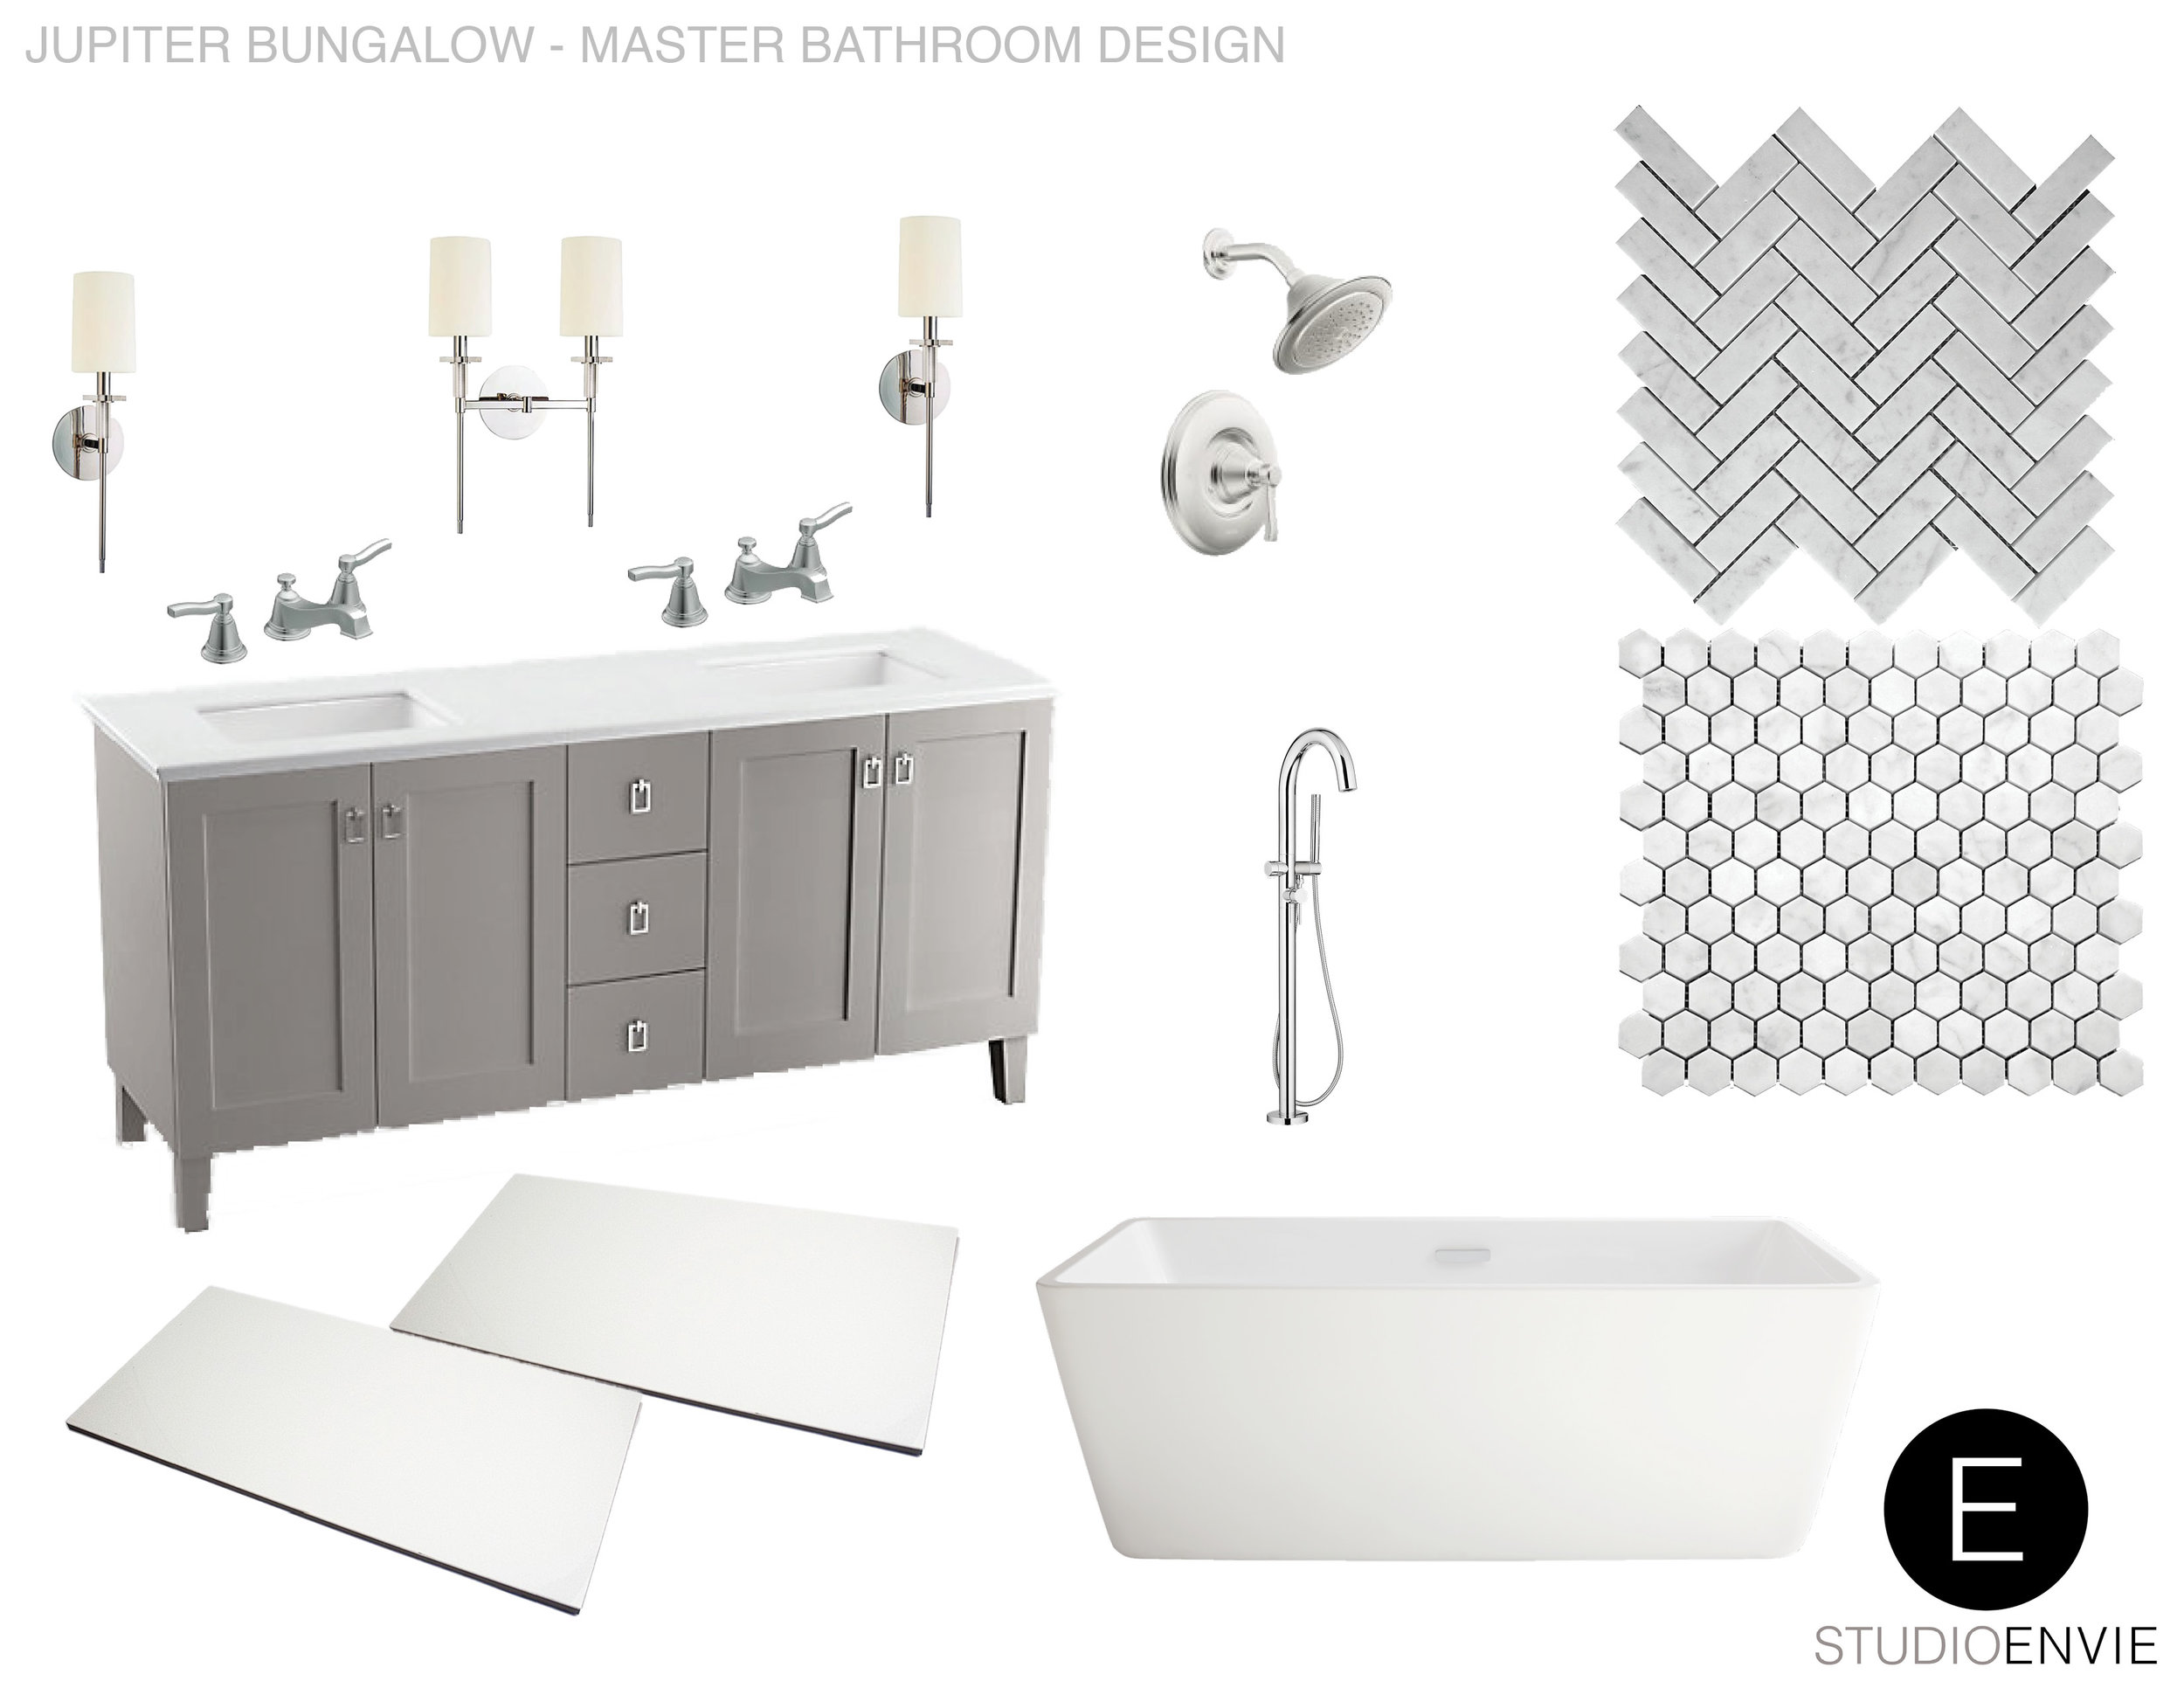 Master Bathroom Design.jpg